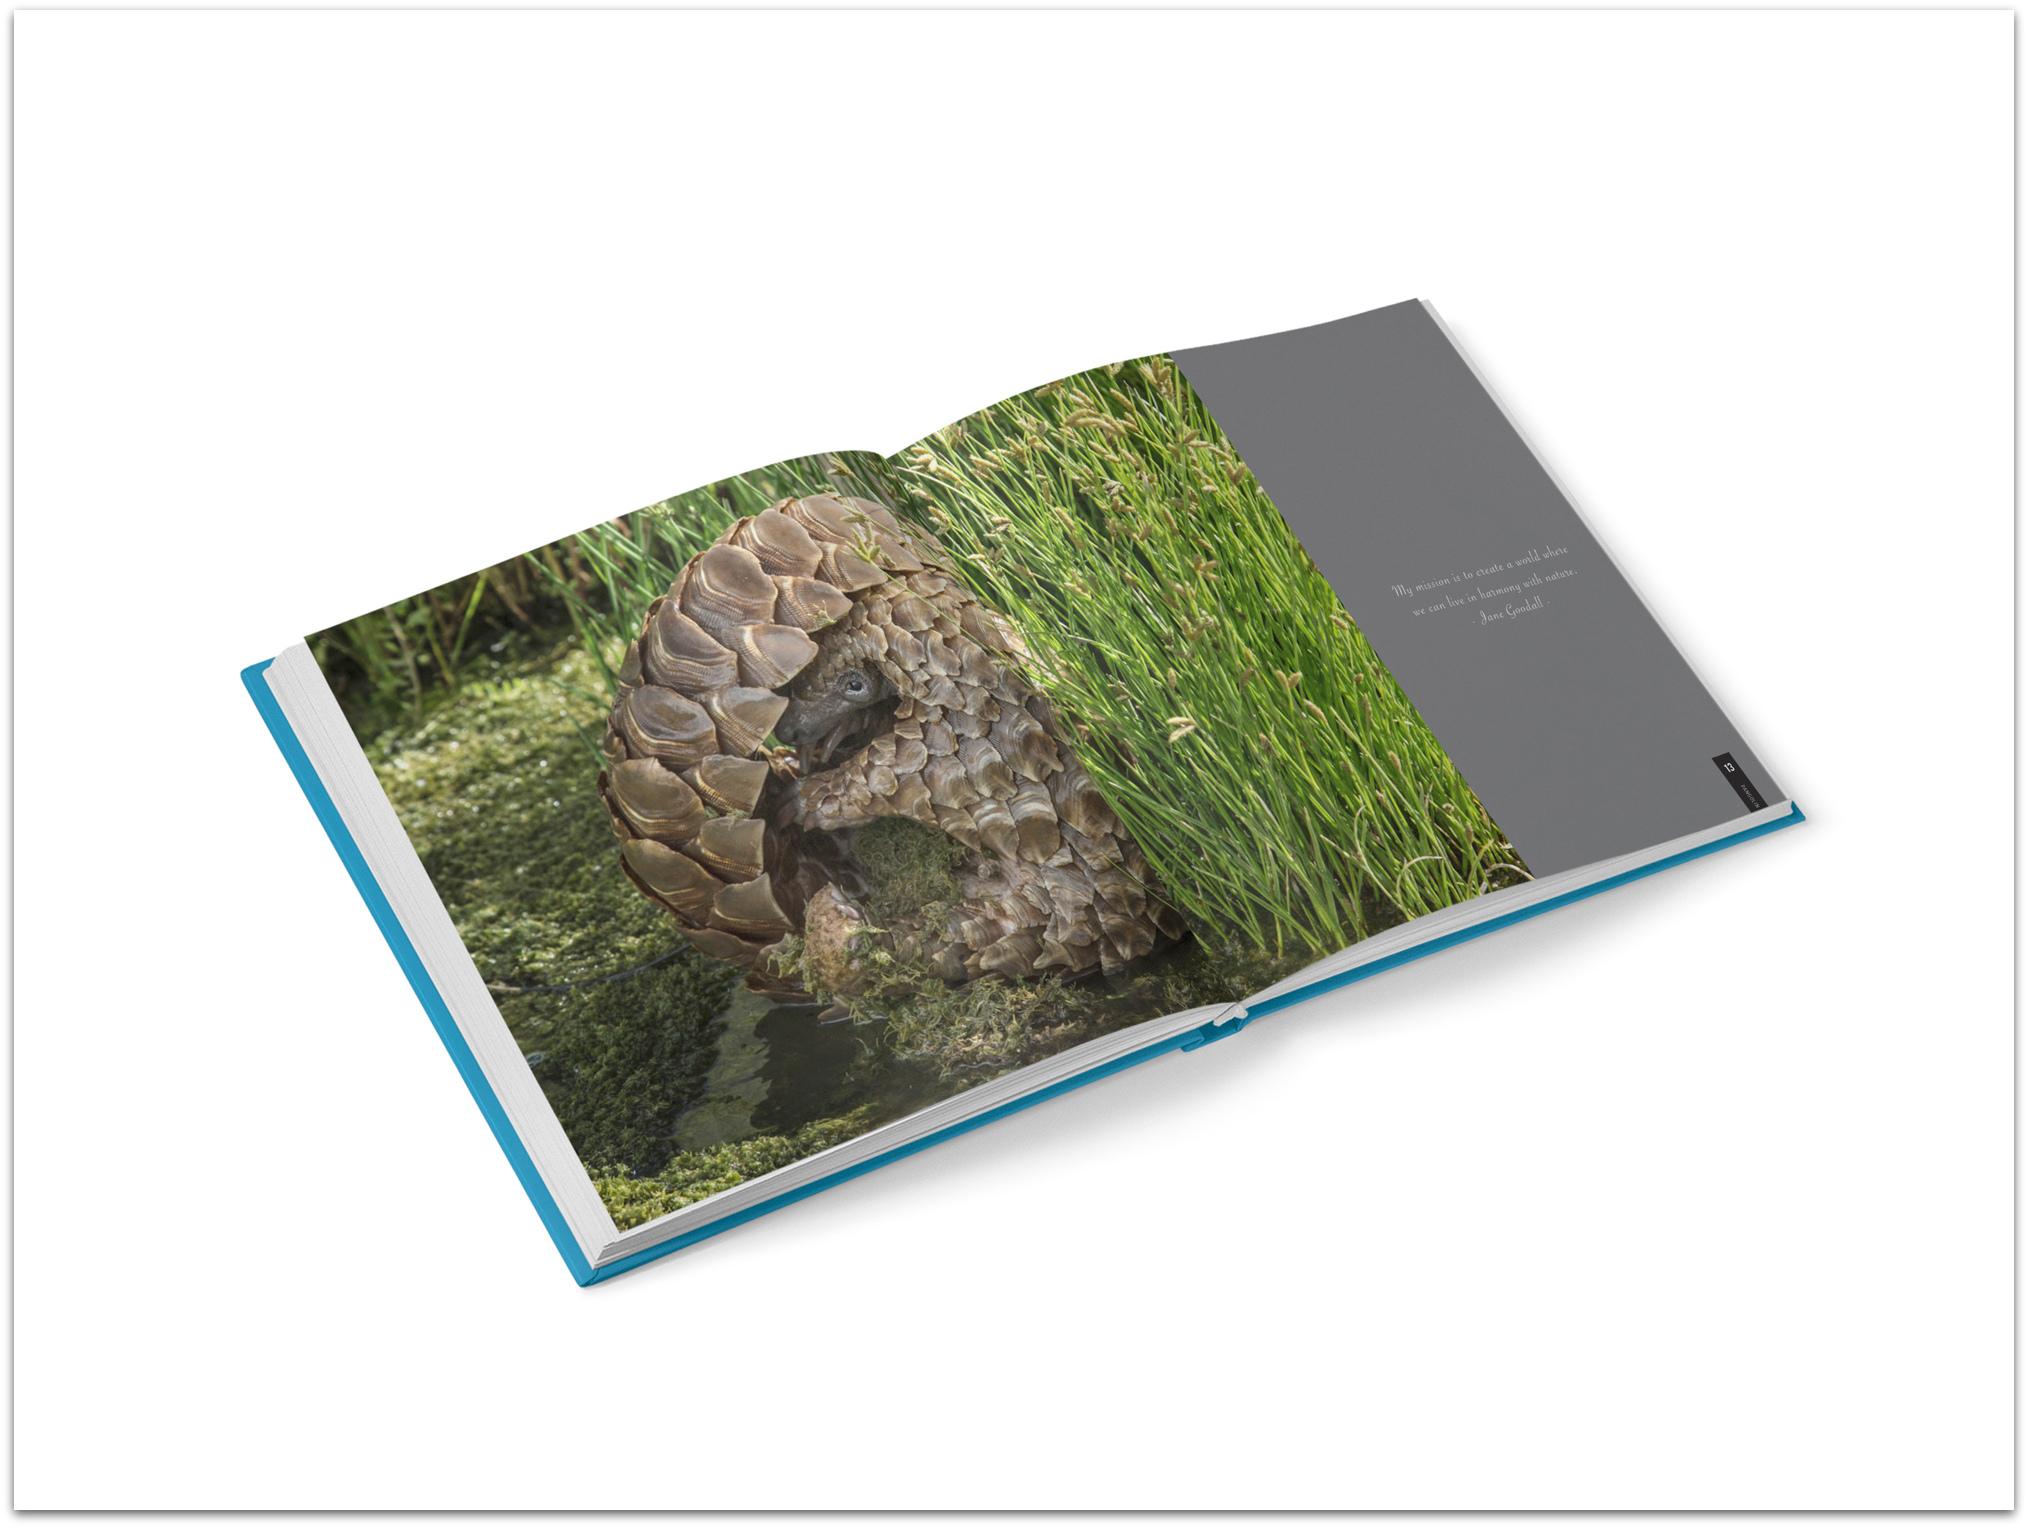 Pangolin book inside spread